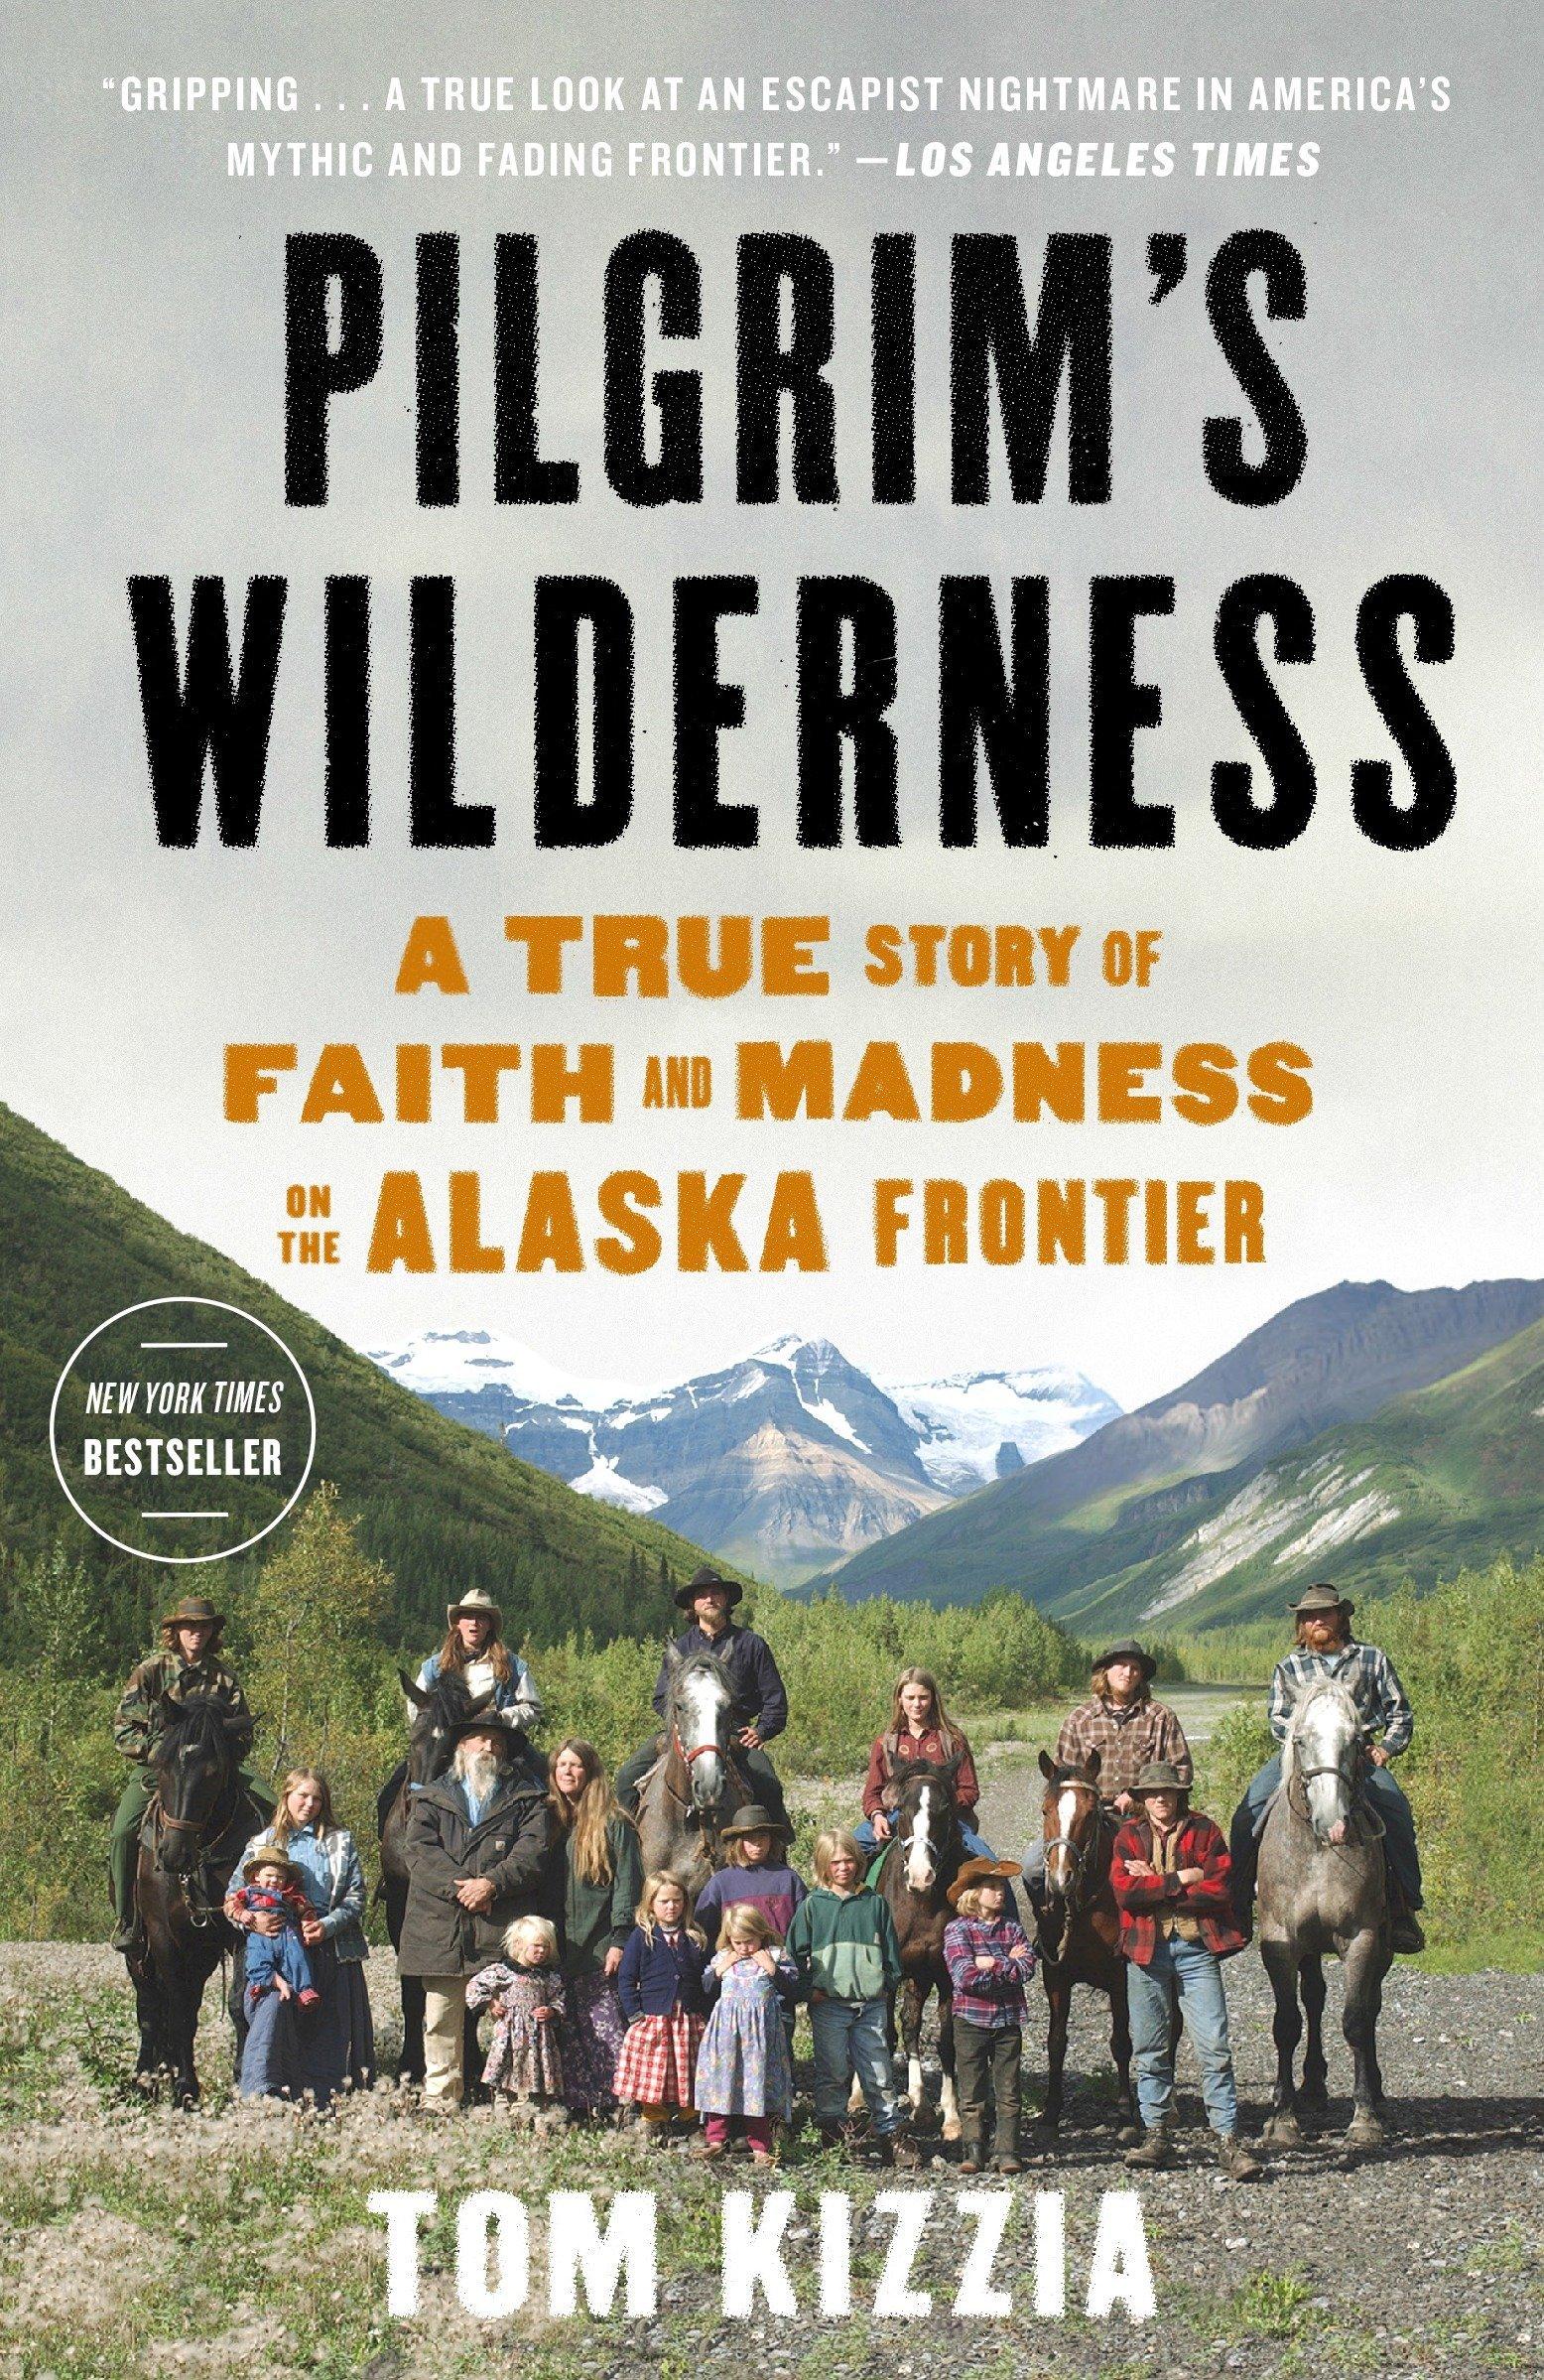 Pilgrim's Wilderness: A True Story of Faith and Madness on the Alaska  Frontier: Tom Kizzia: 9780307587831: Amazon.com: Books